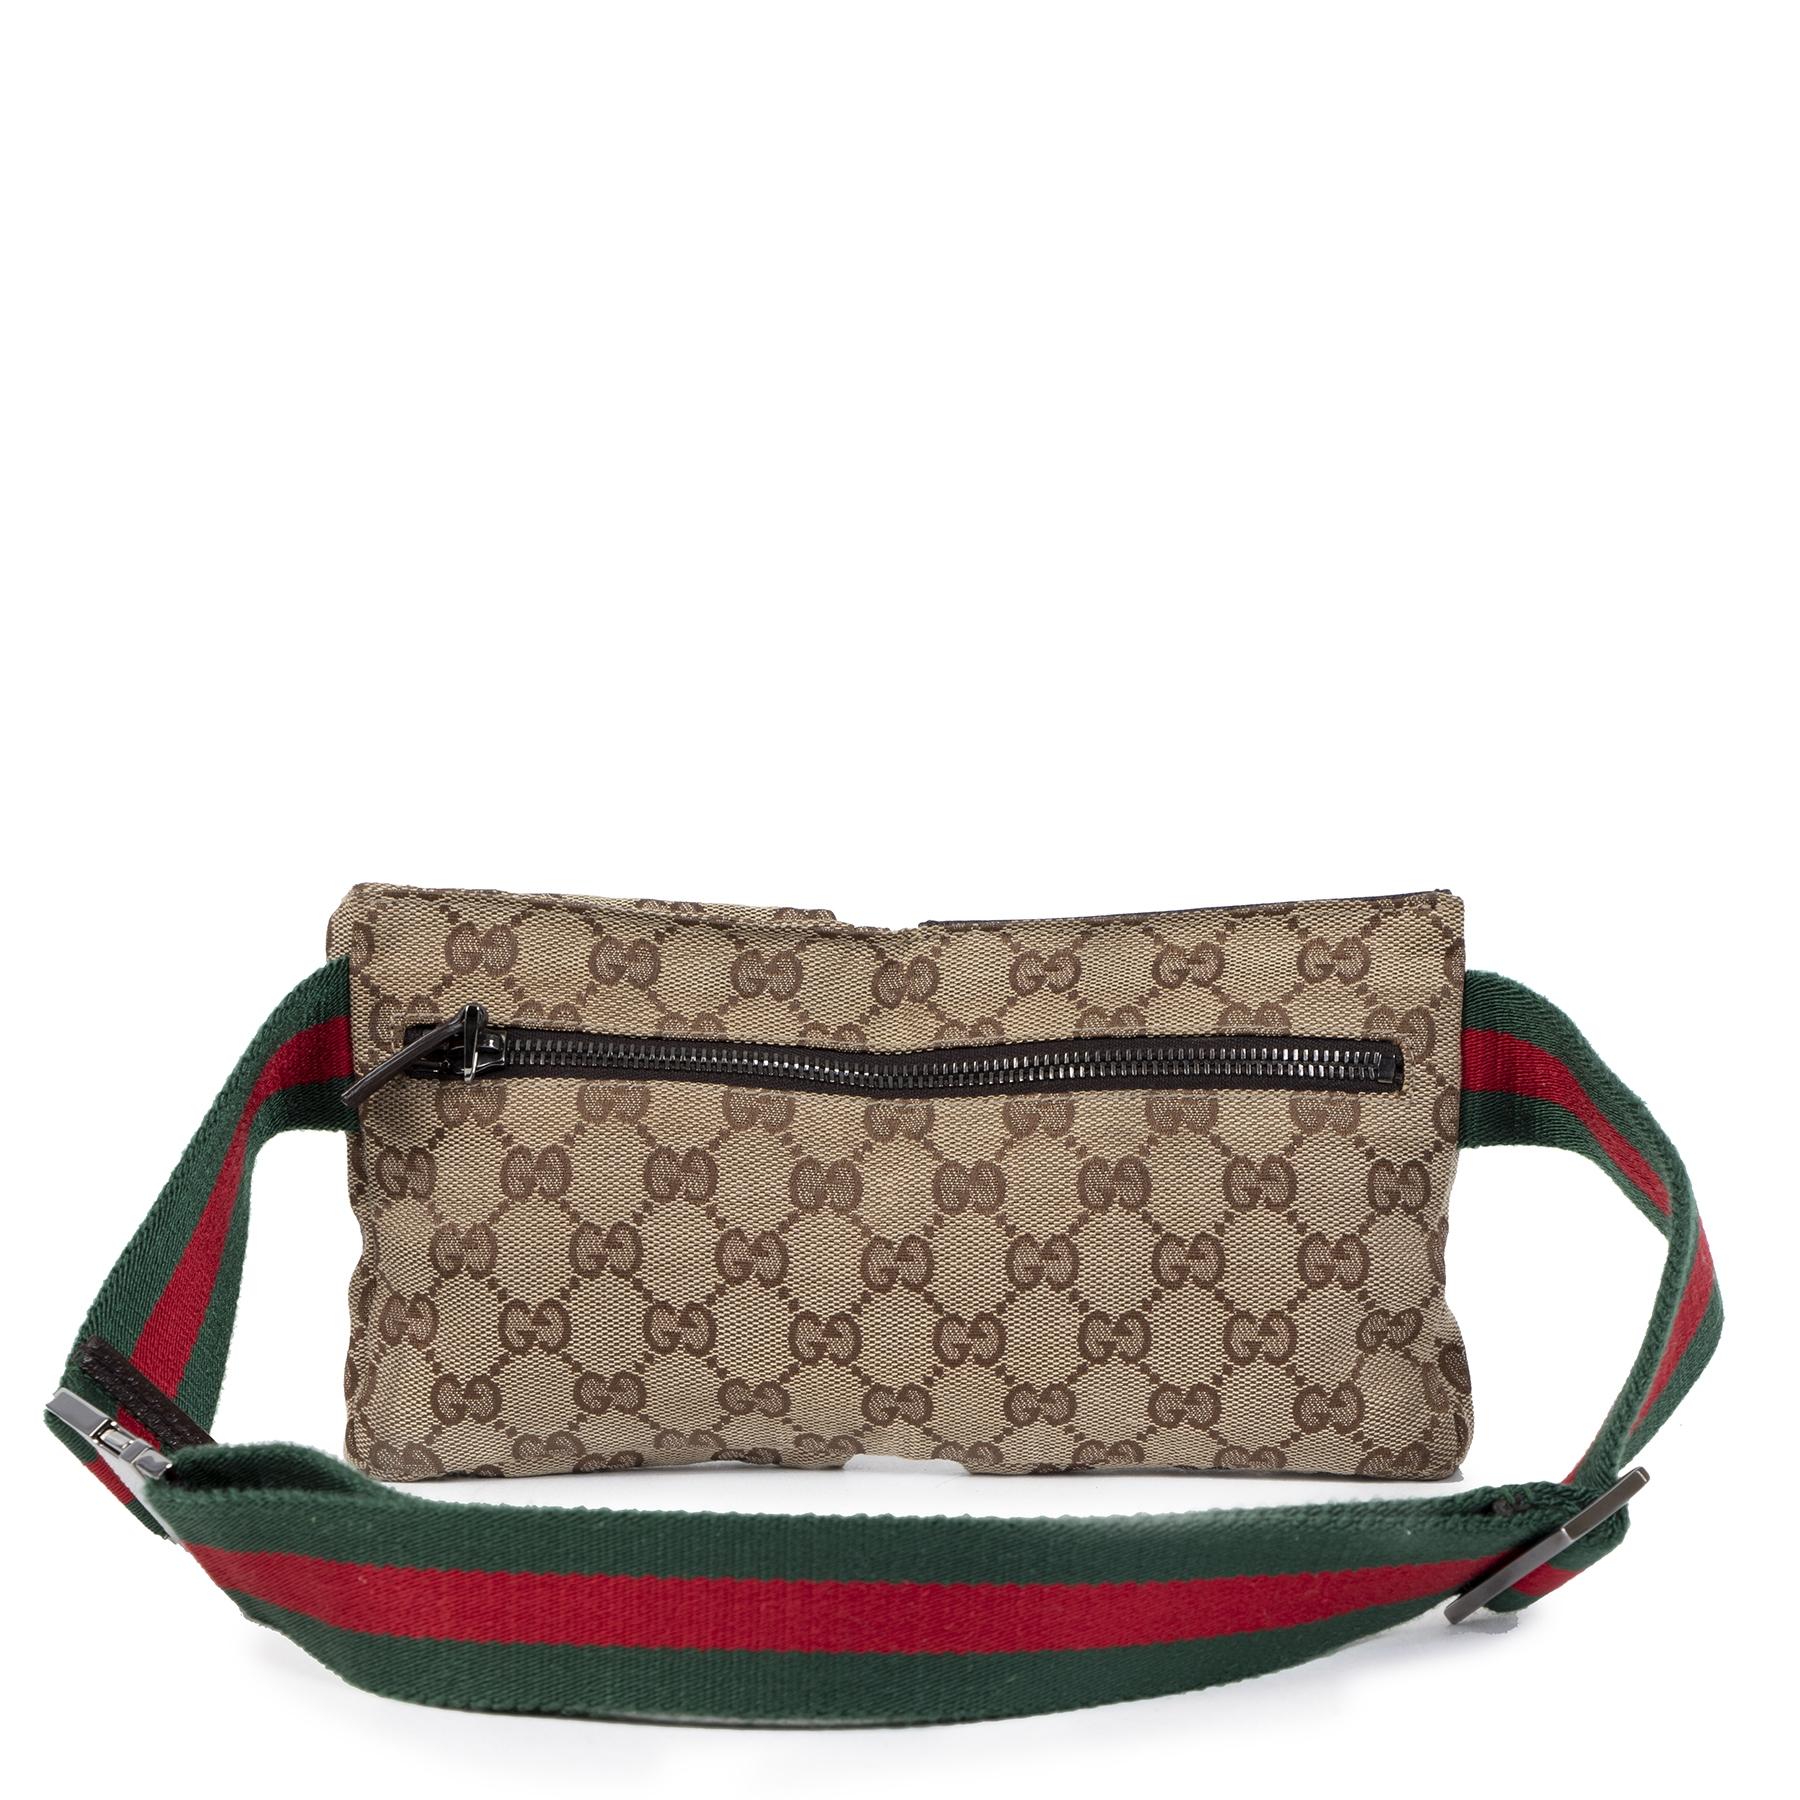 Authentic secondhand Gucci GG Monogram Web Belt Bag designer bags designer brands fashion safe secure online shopping worldwide shipping delivery